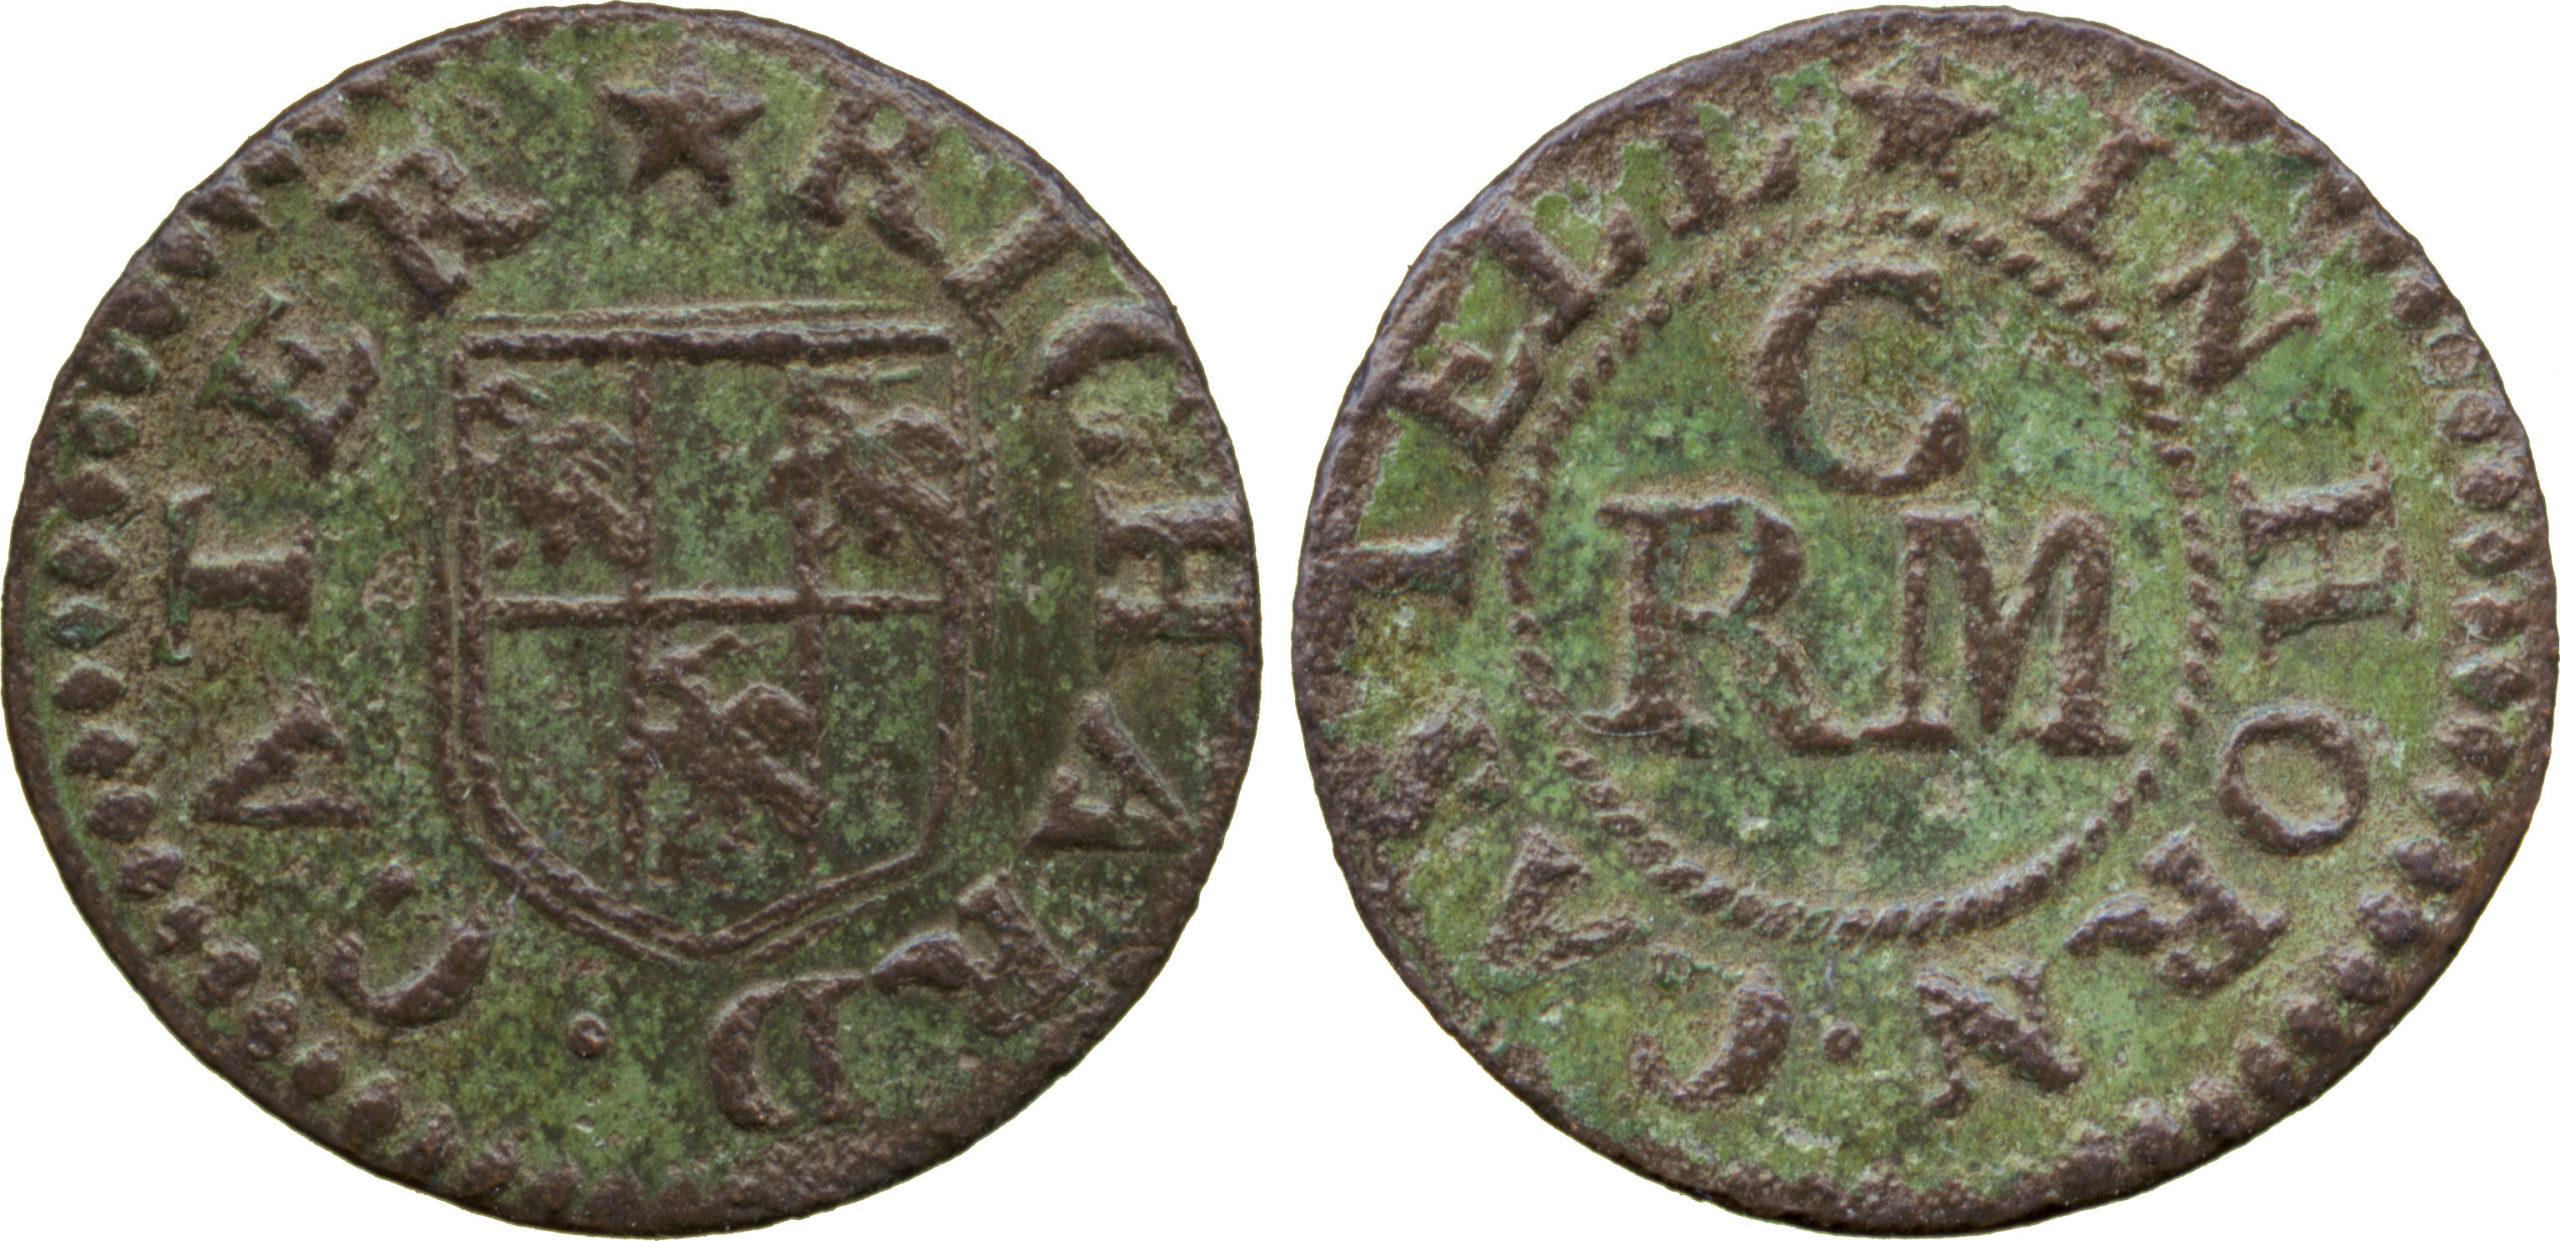 Lincolnshire, Horncastle, Farthing Token, c.1670